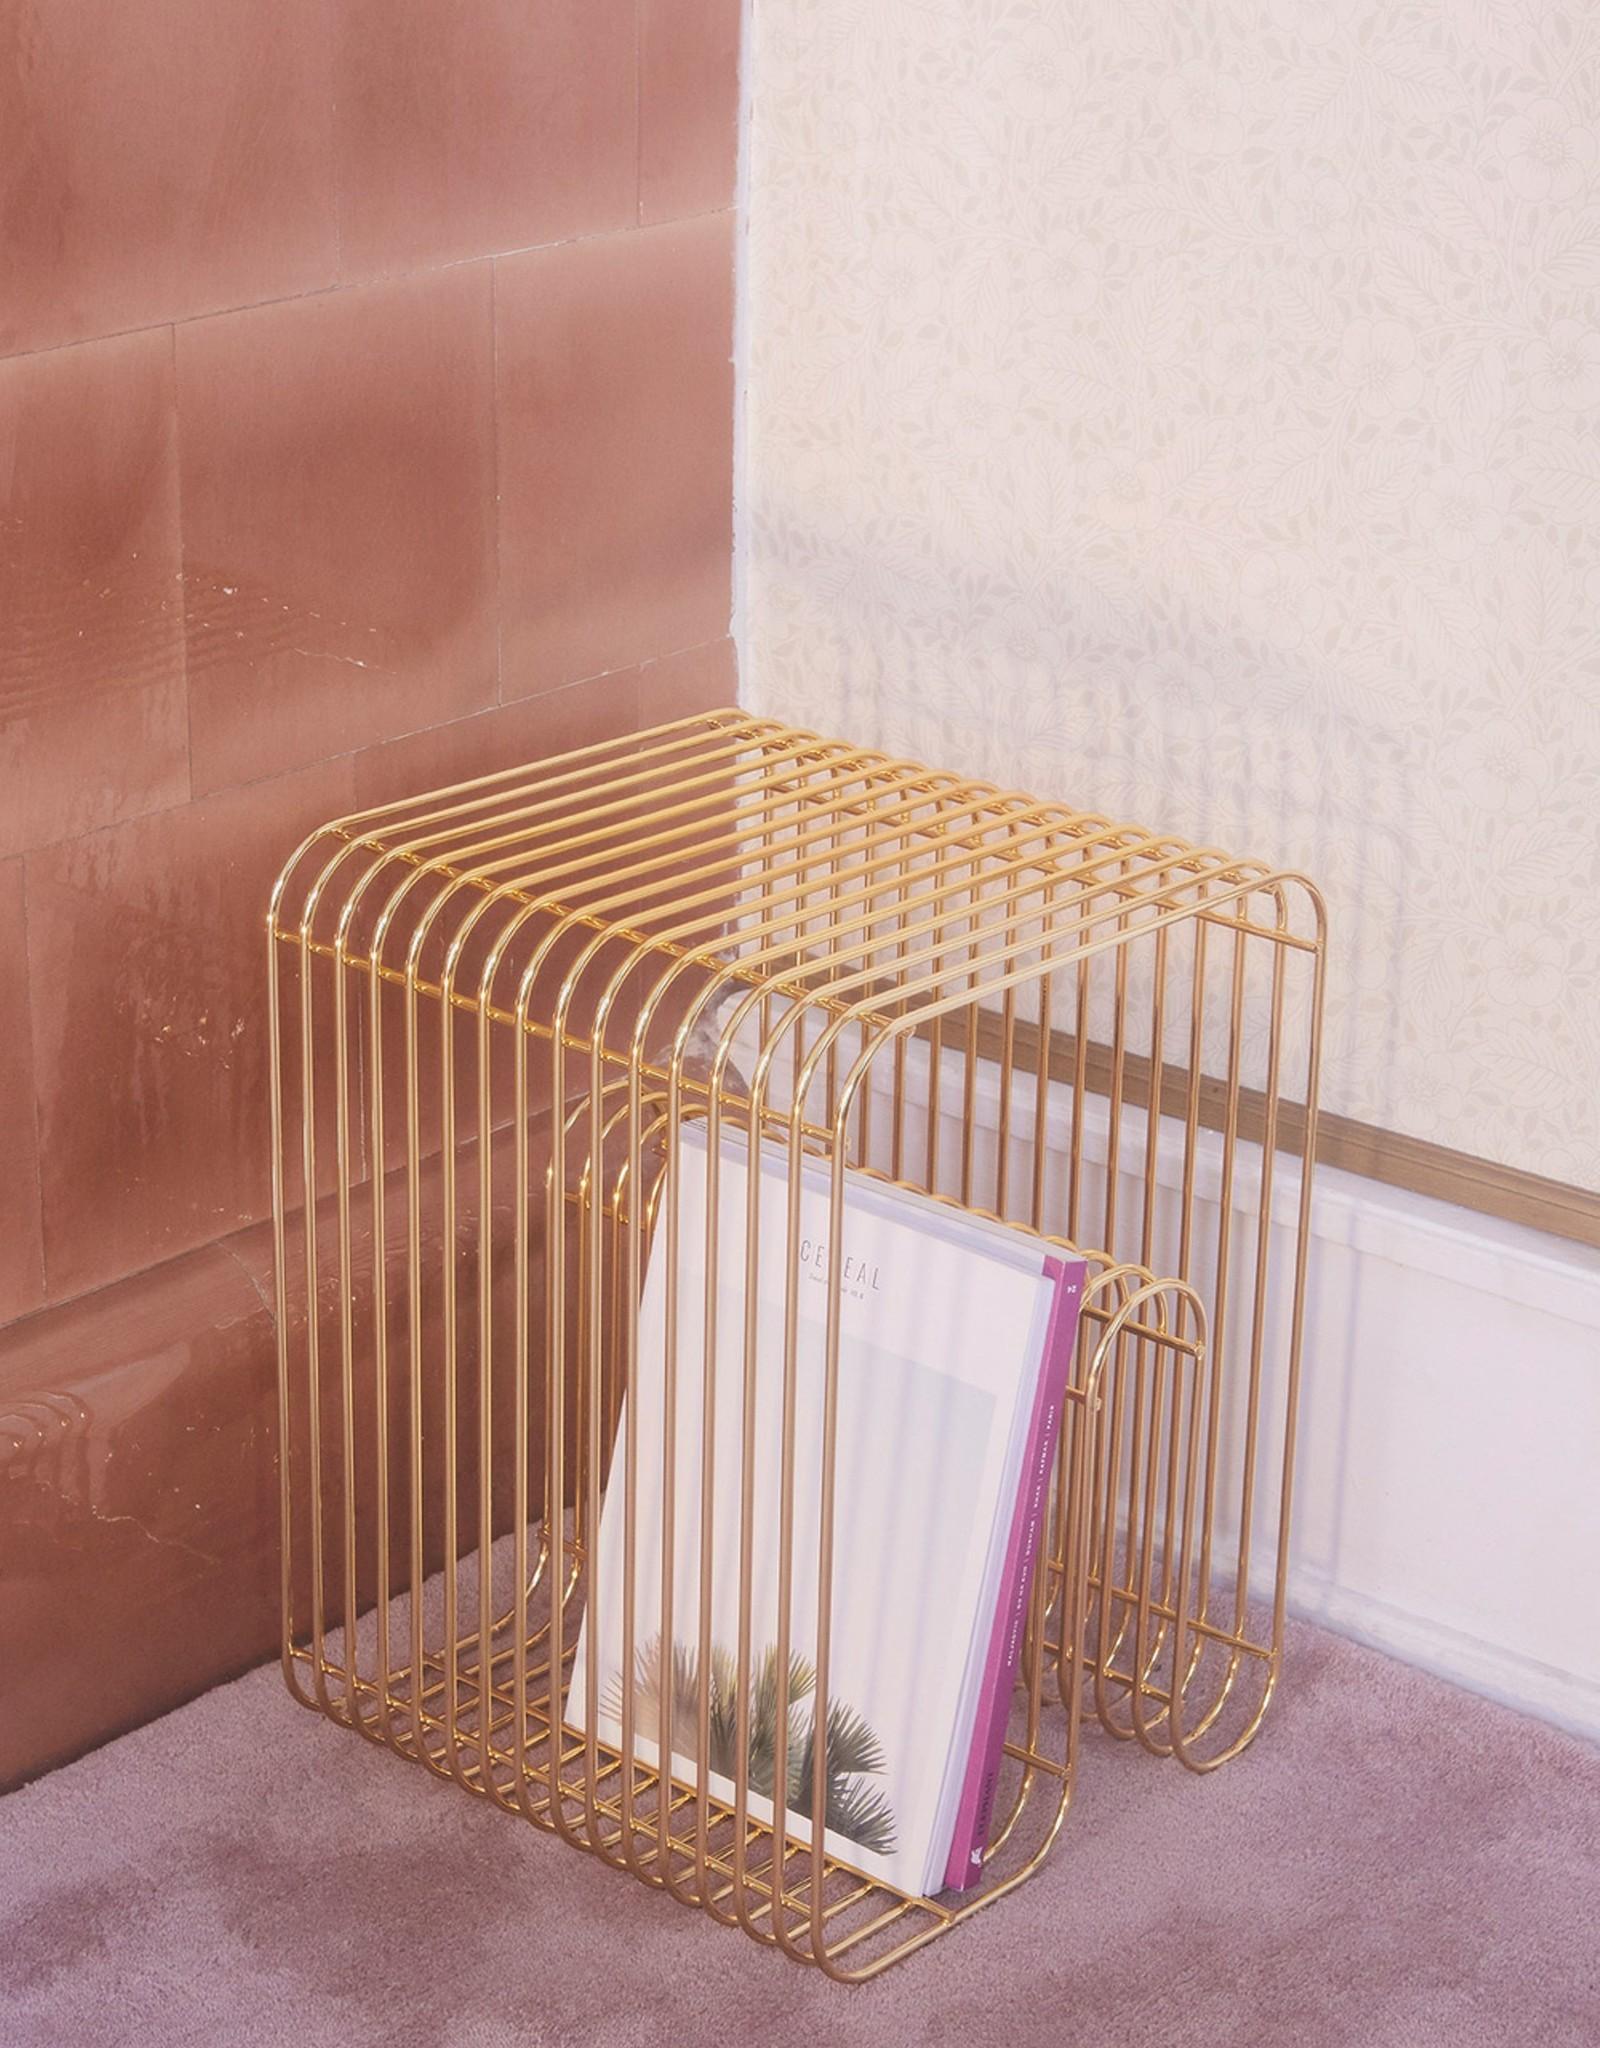 AYTM AYTM Curva stool